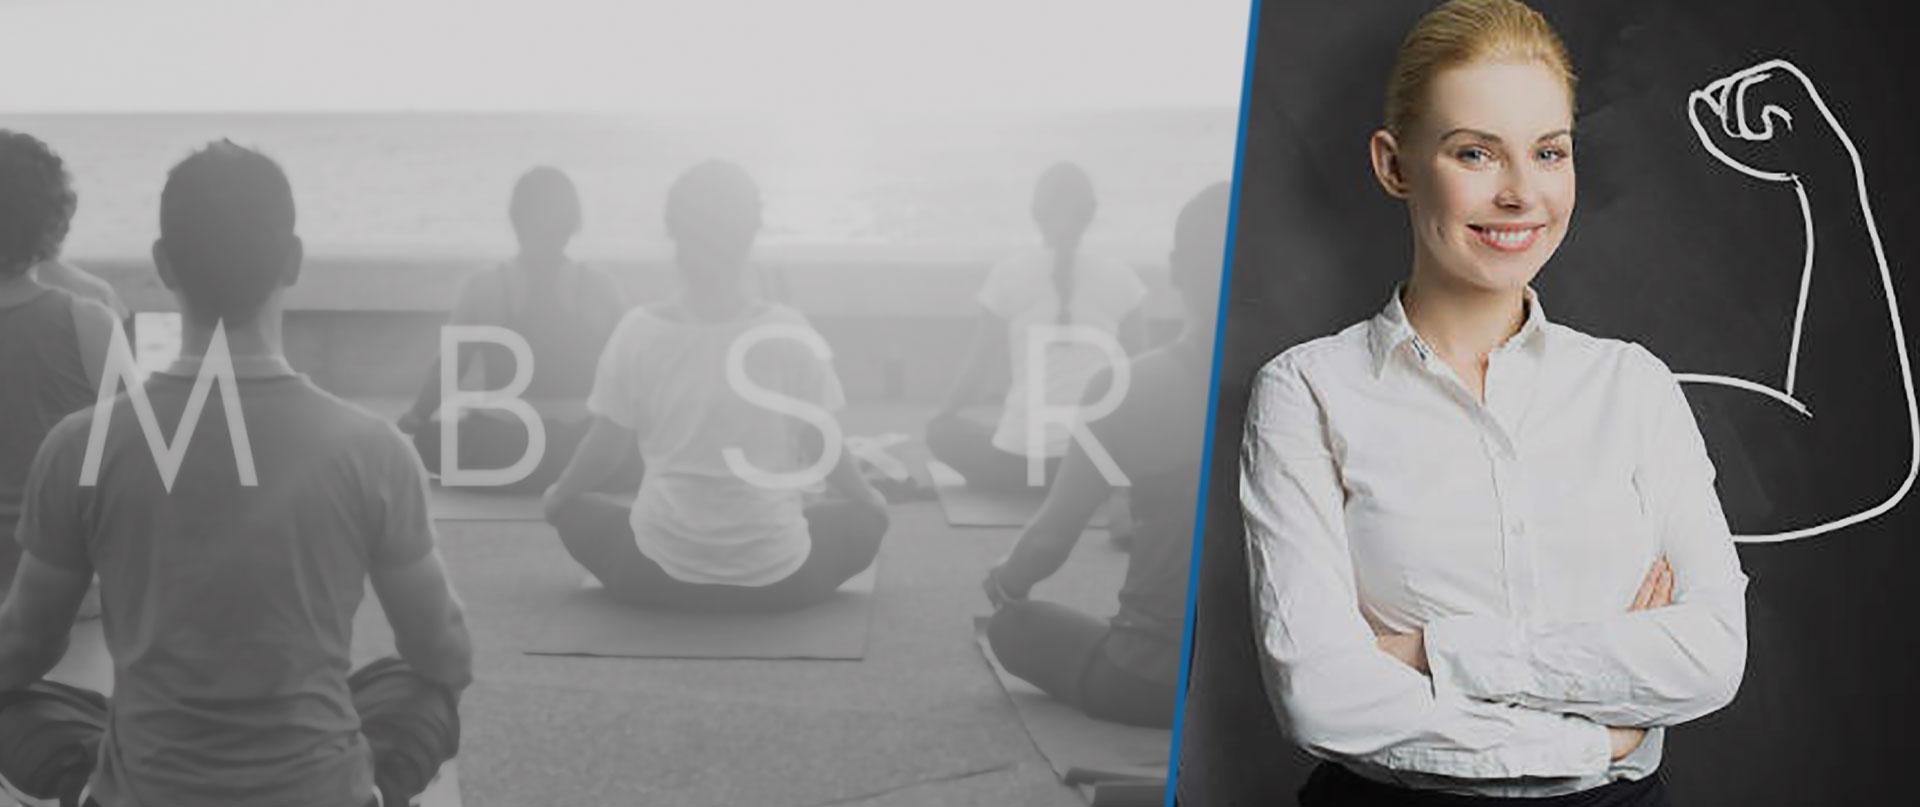 Terapia di Gruppo – MBSR